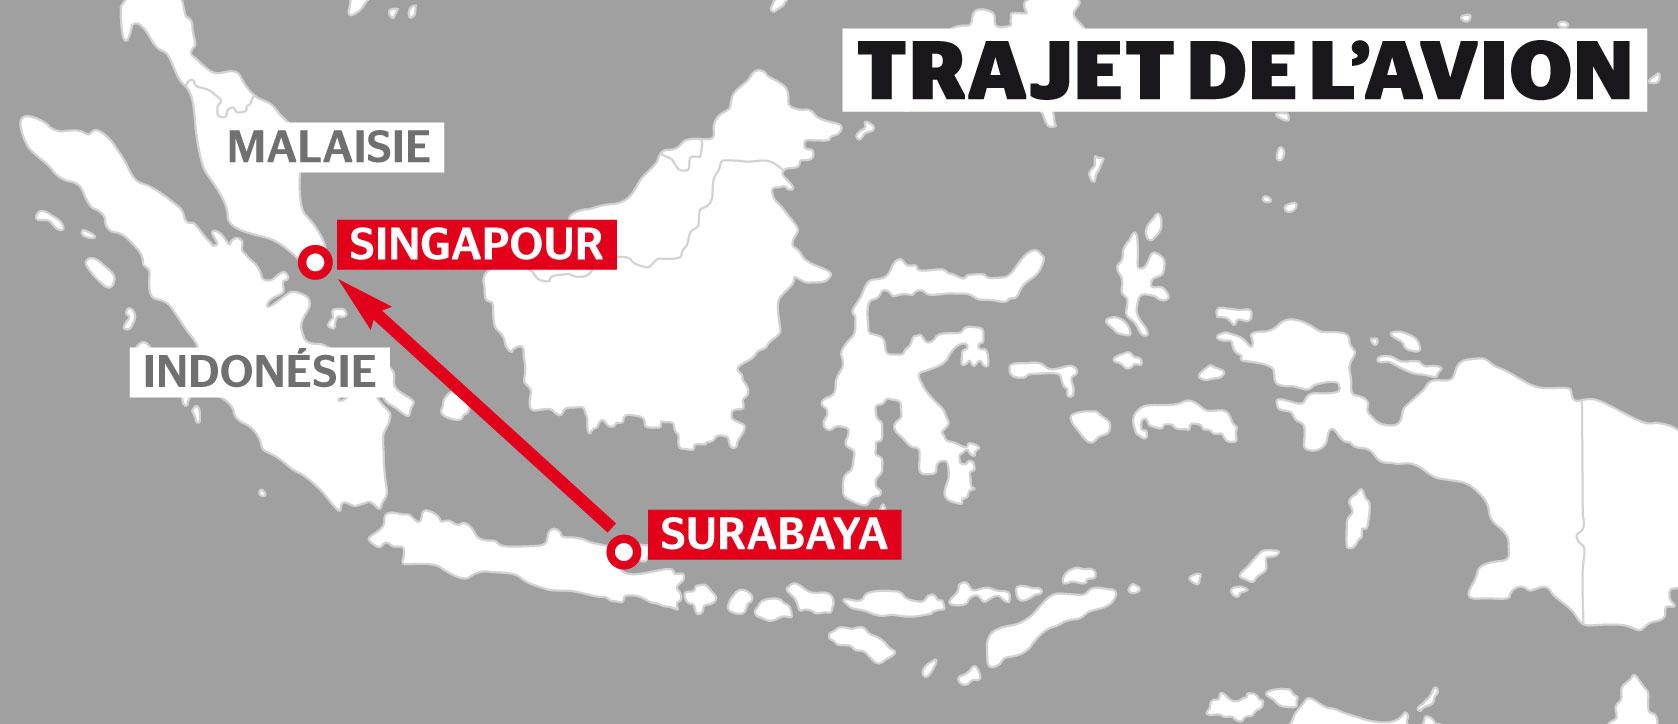 trajet indonesie singapour